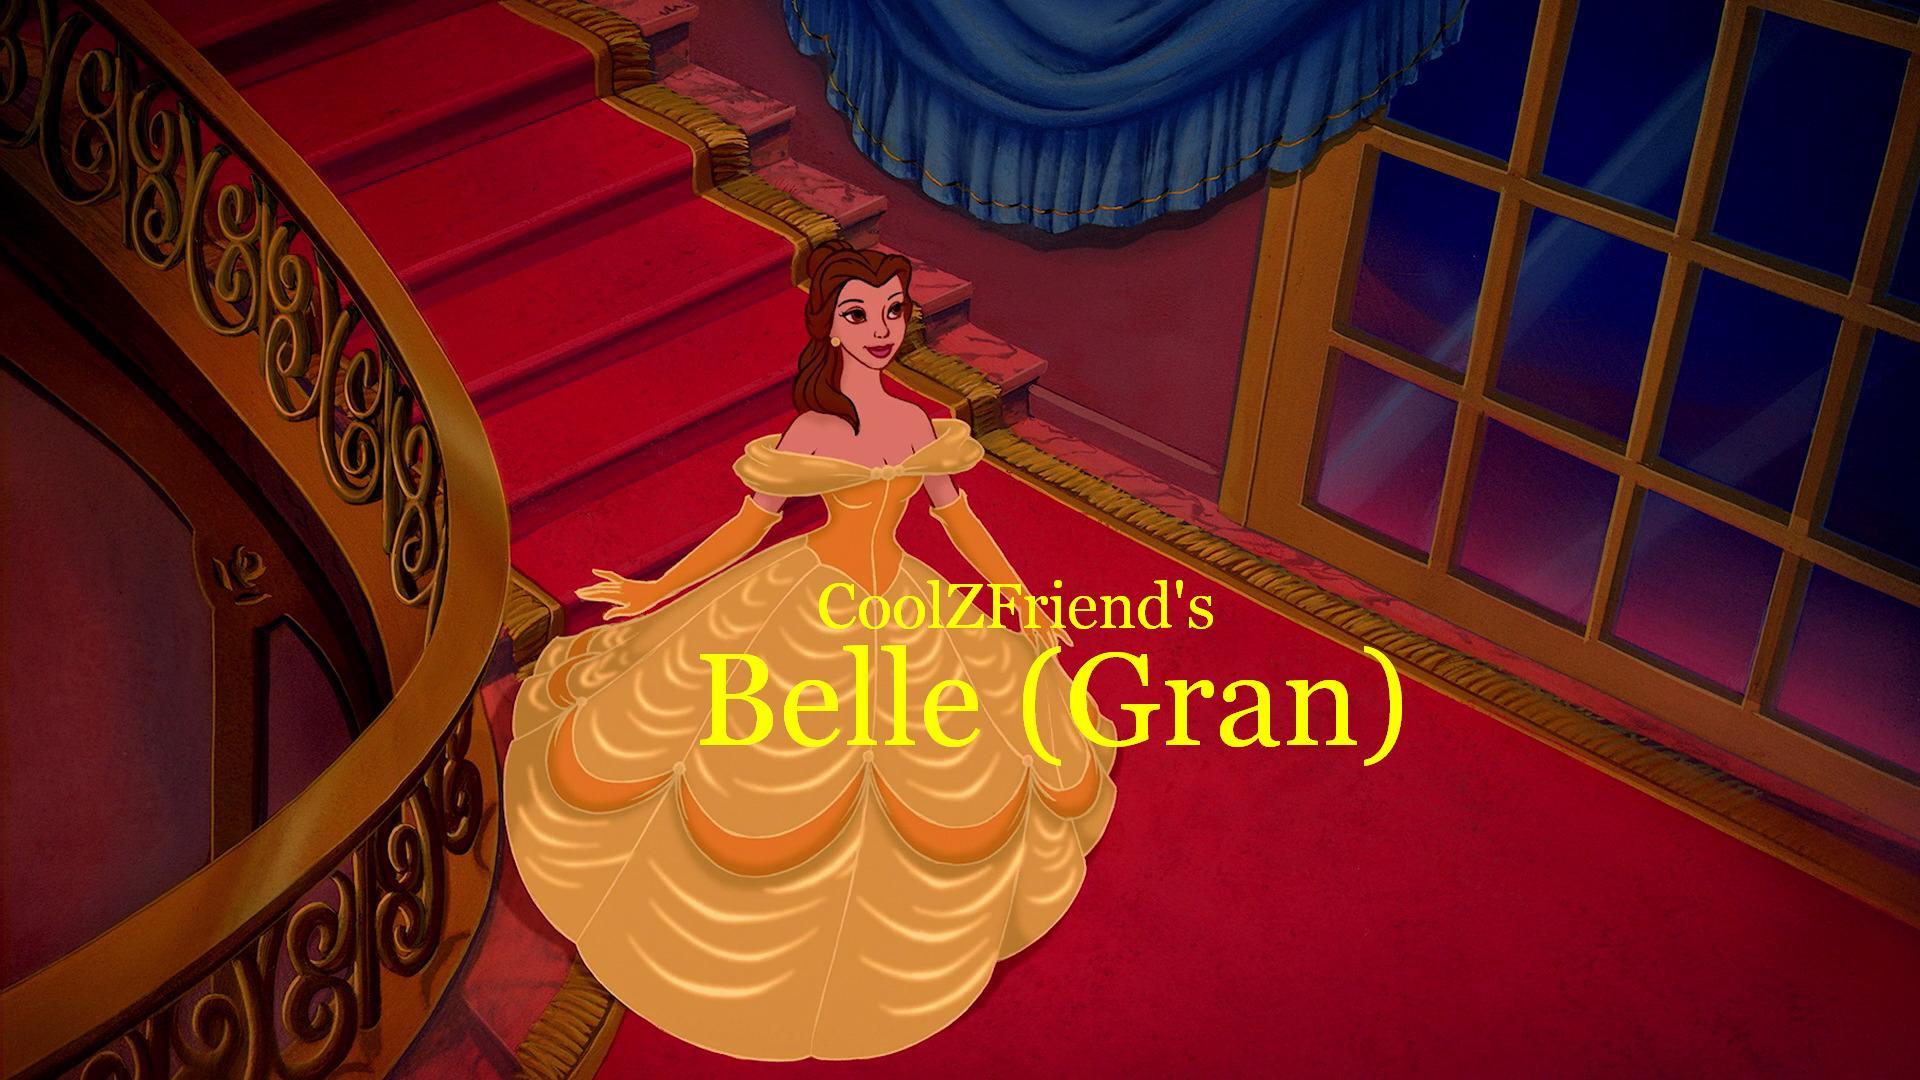 Belle (Gran)